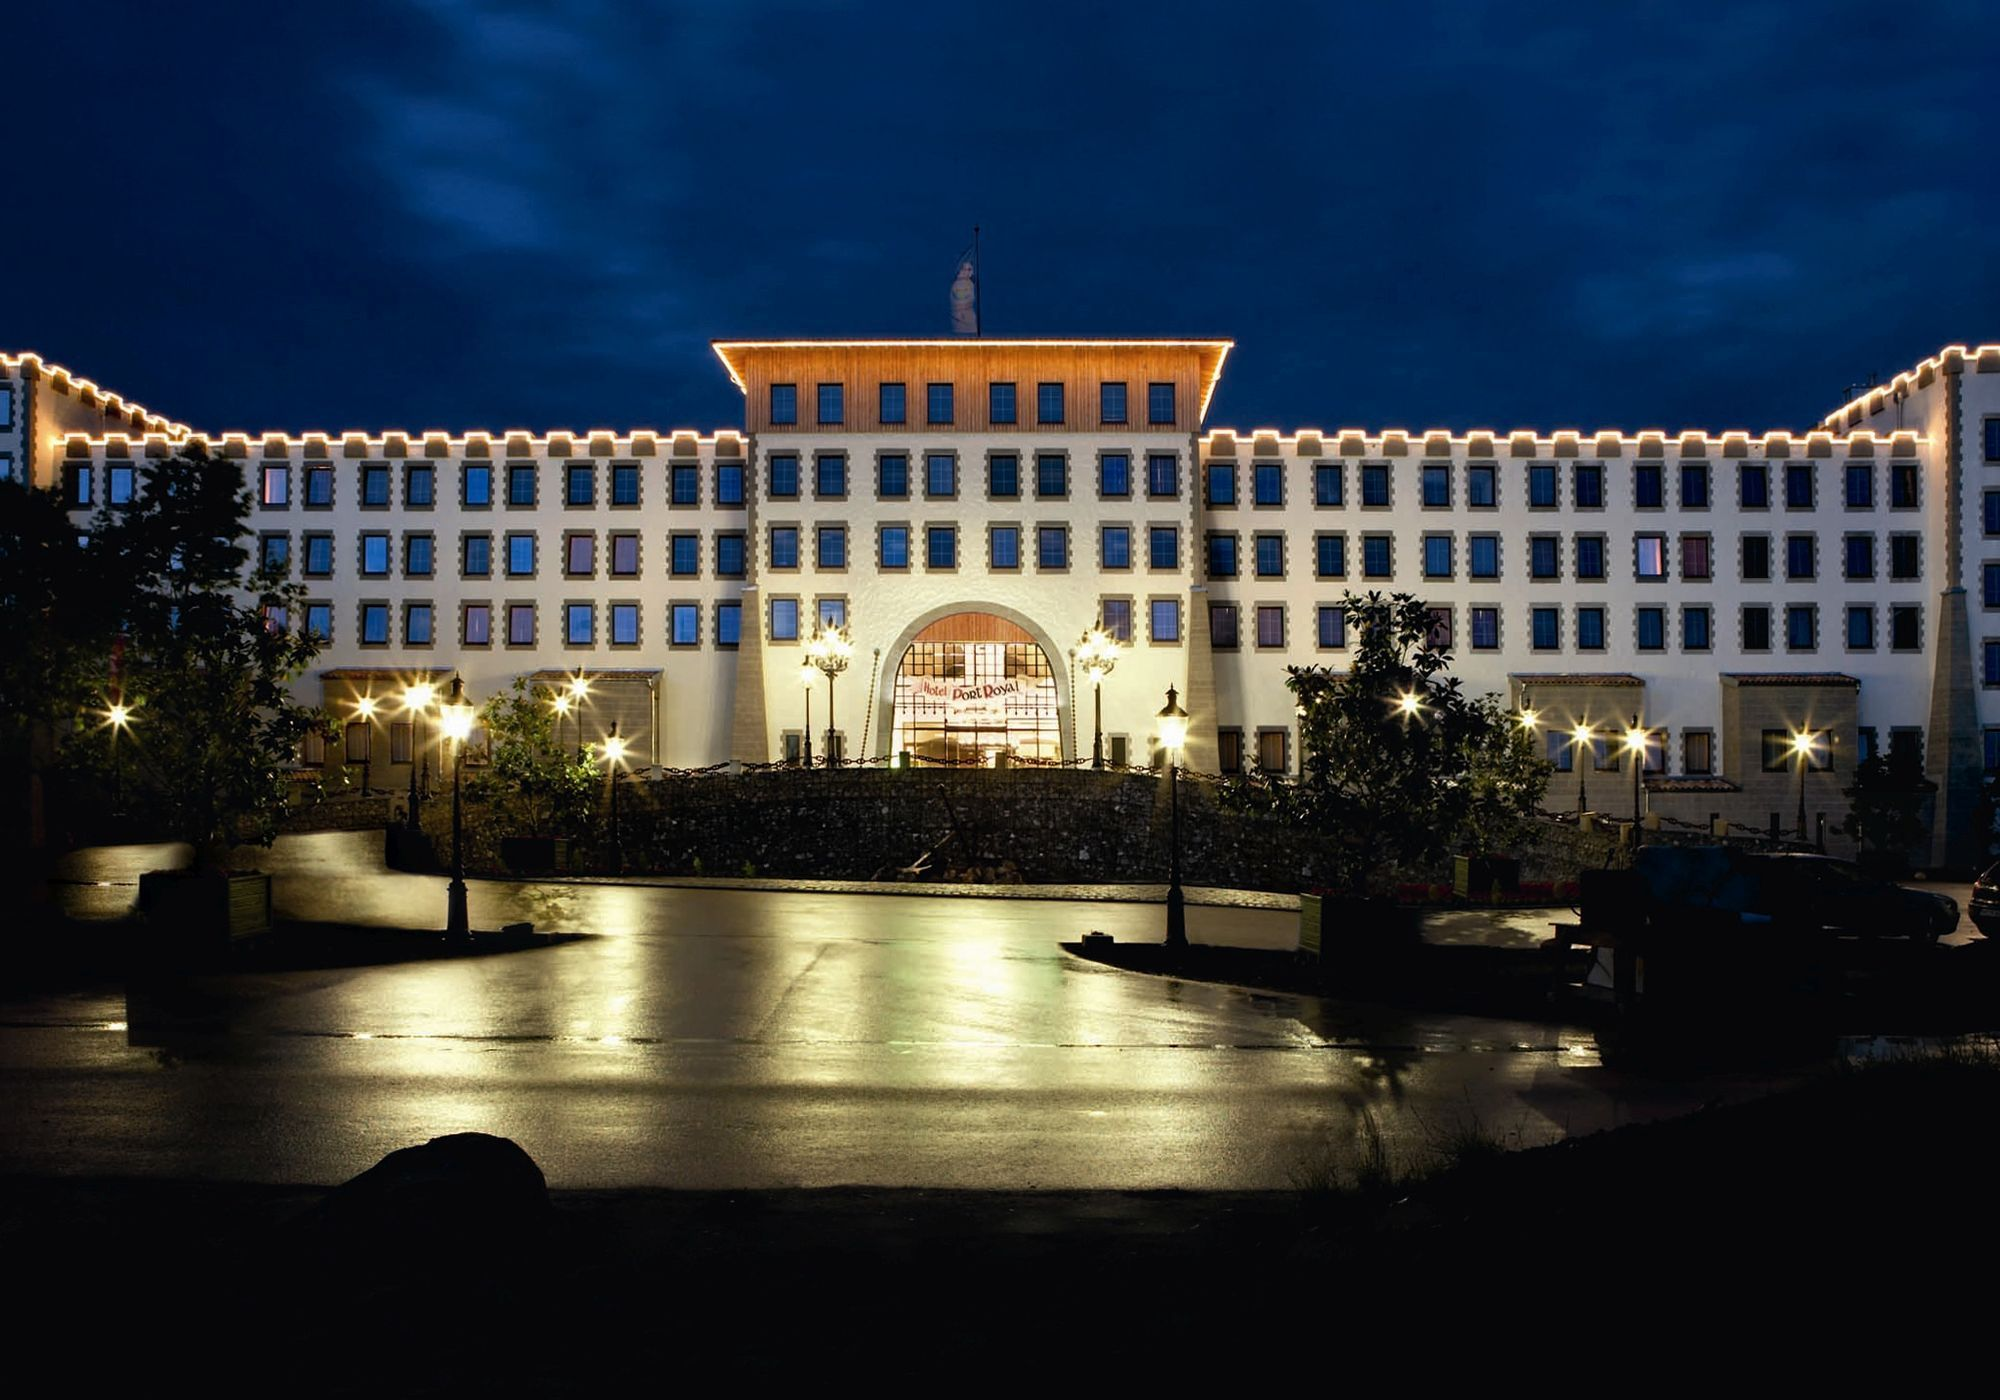 Hotel Port Royal Heidepark Soltau Rimpf Architektur